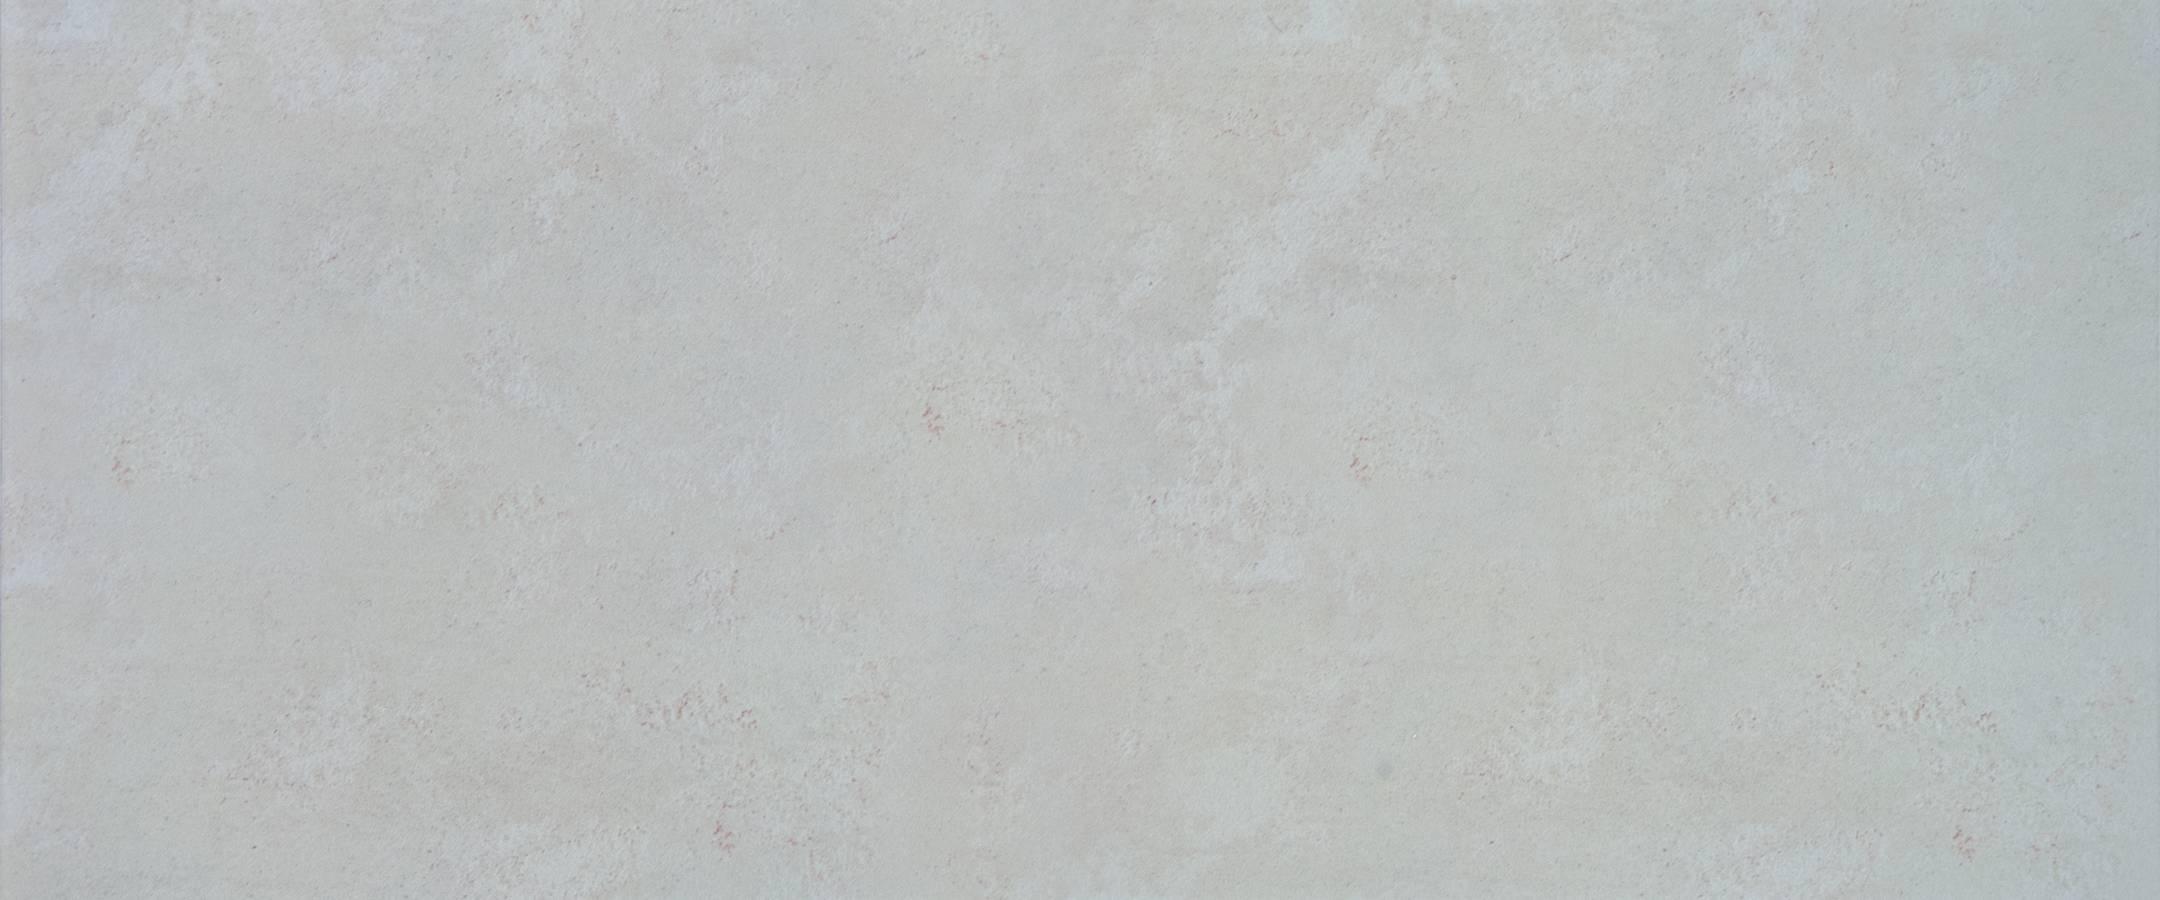 Плитка настенная Gracia Ceramica Orion 01 beige 250х600